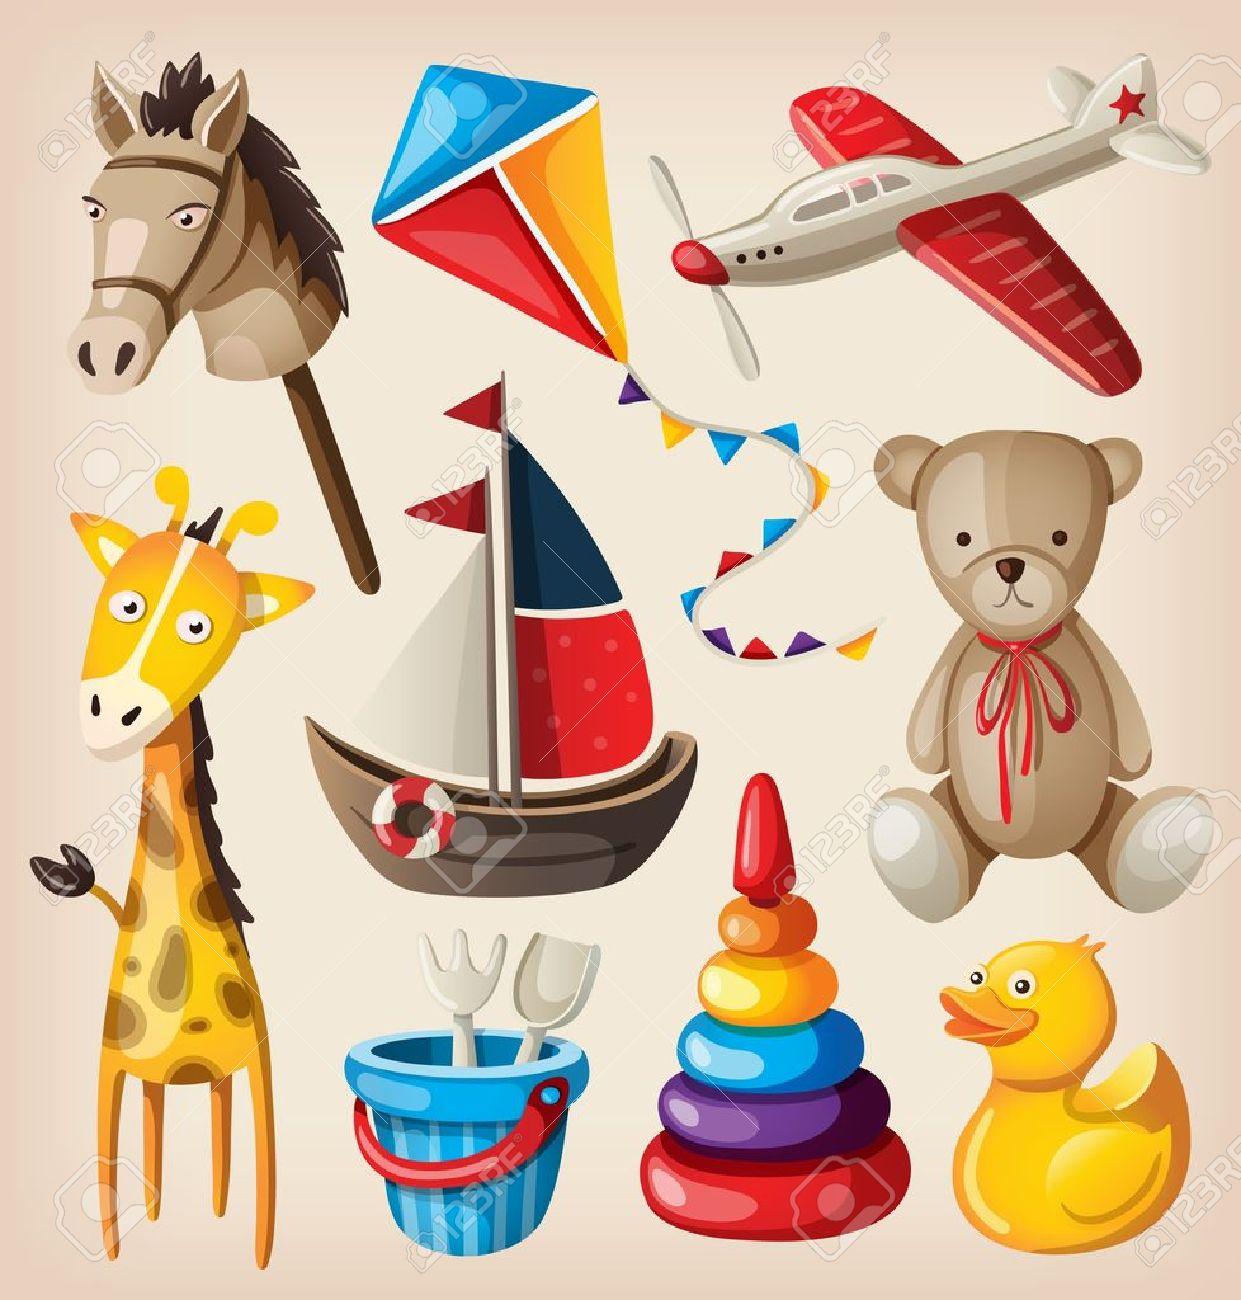 juguetes antiguos conjunto de coloridos juguetes antiguos para nios vectores